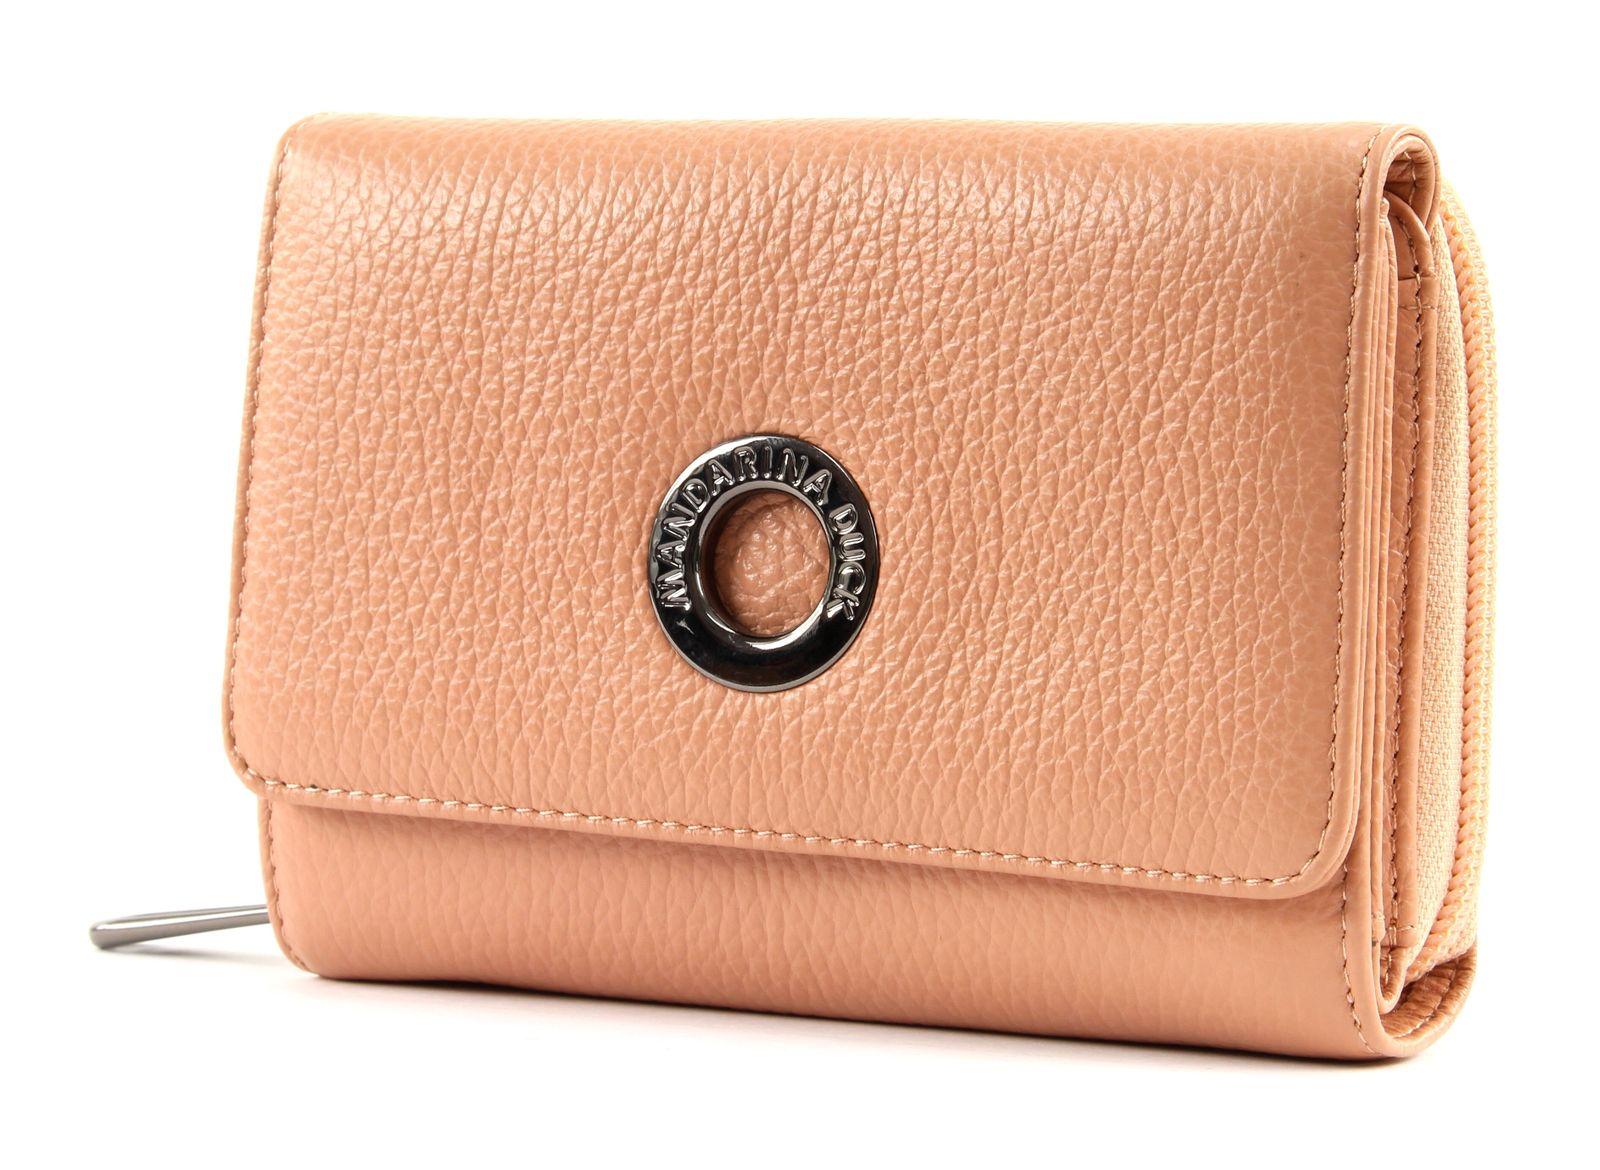 Mandarina Duck Mellow Leather S Purse Paloma KjmsTn03J